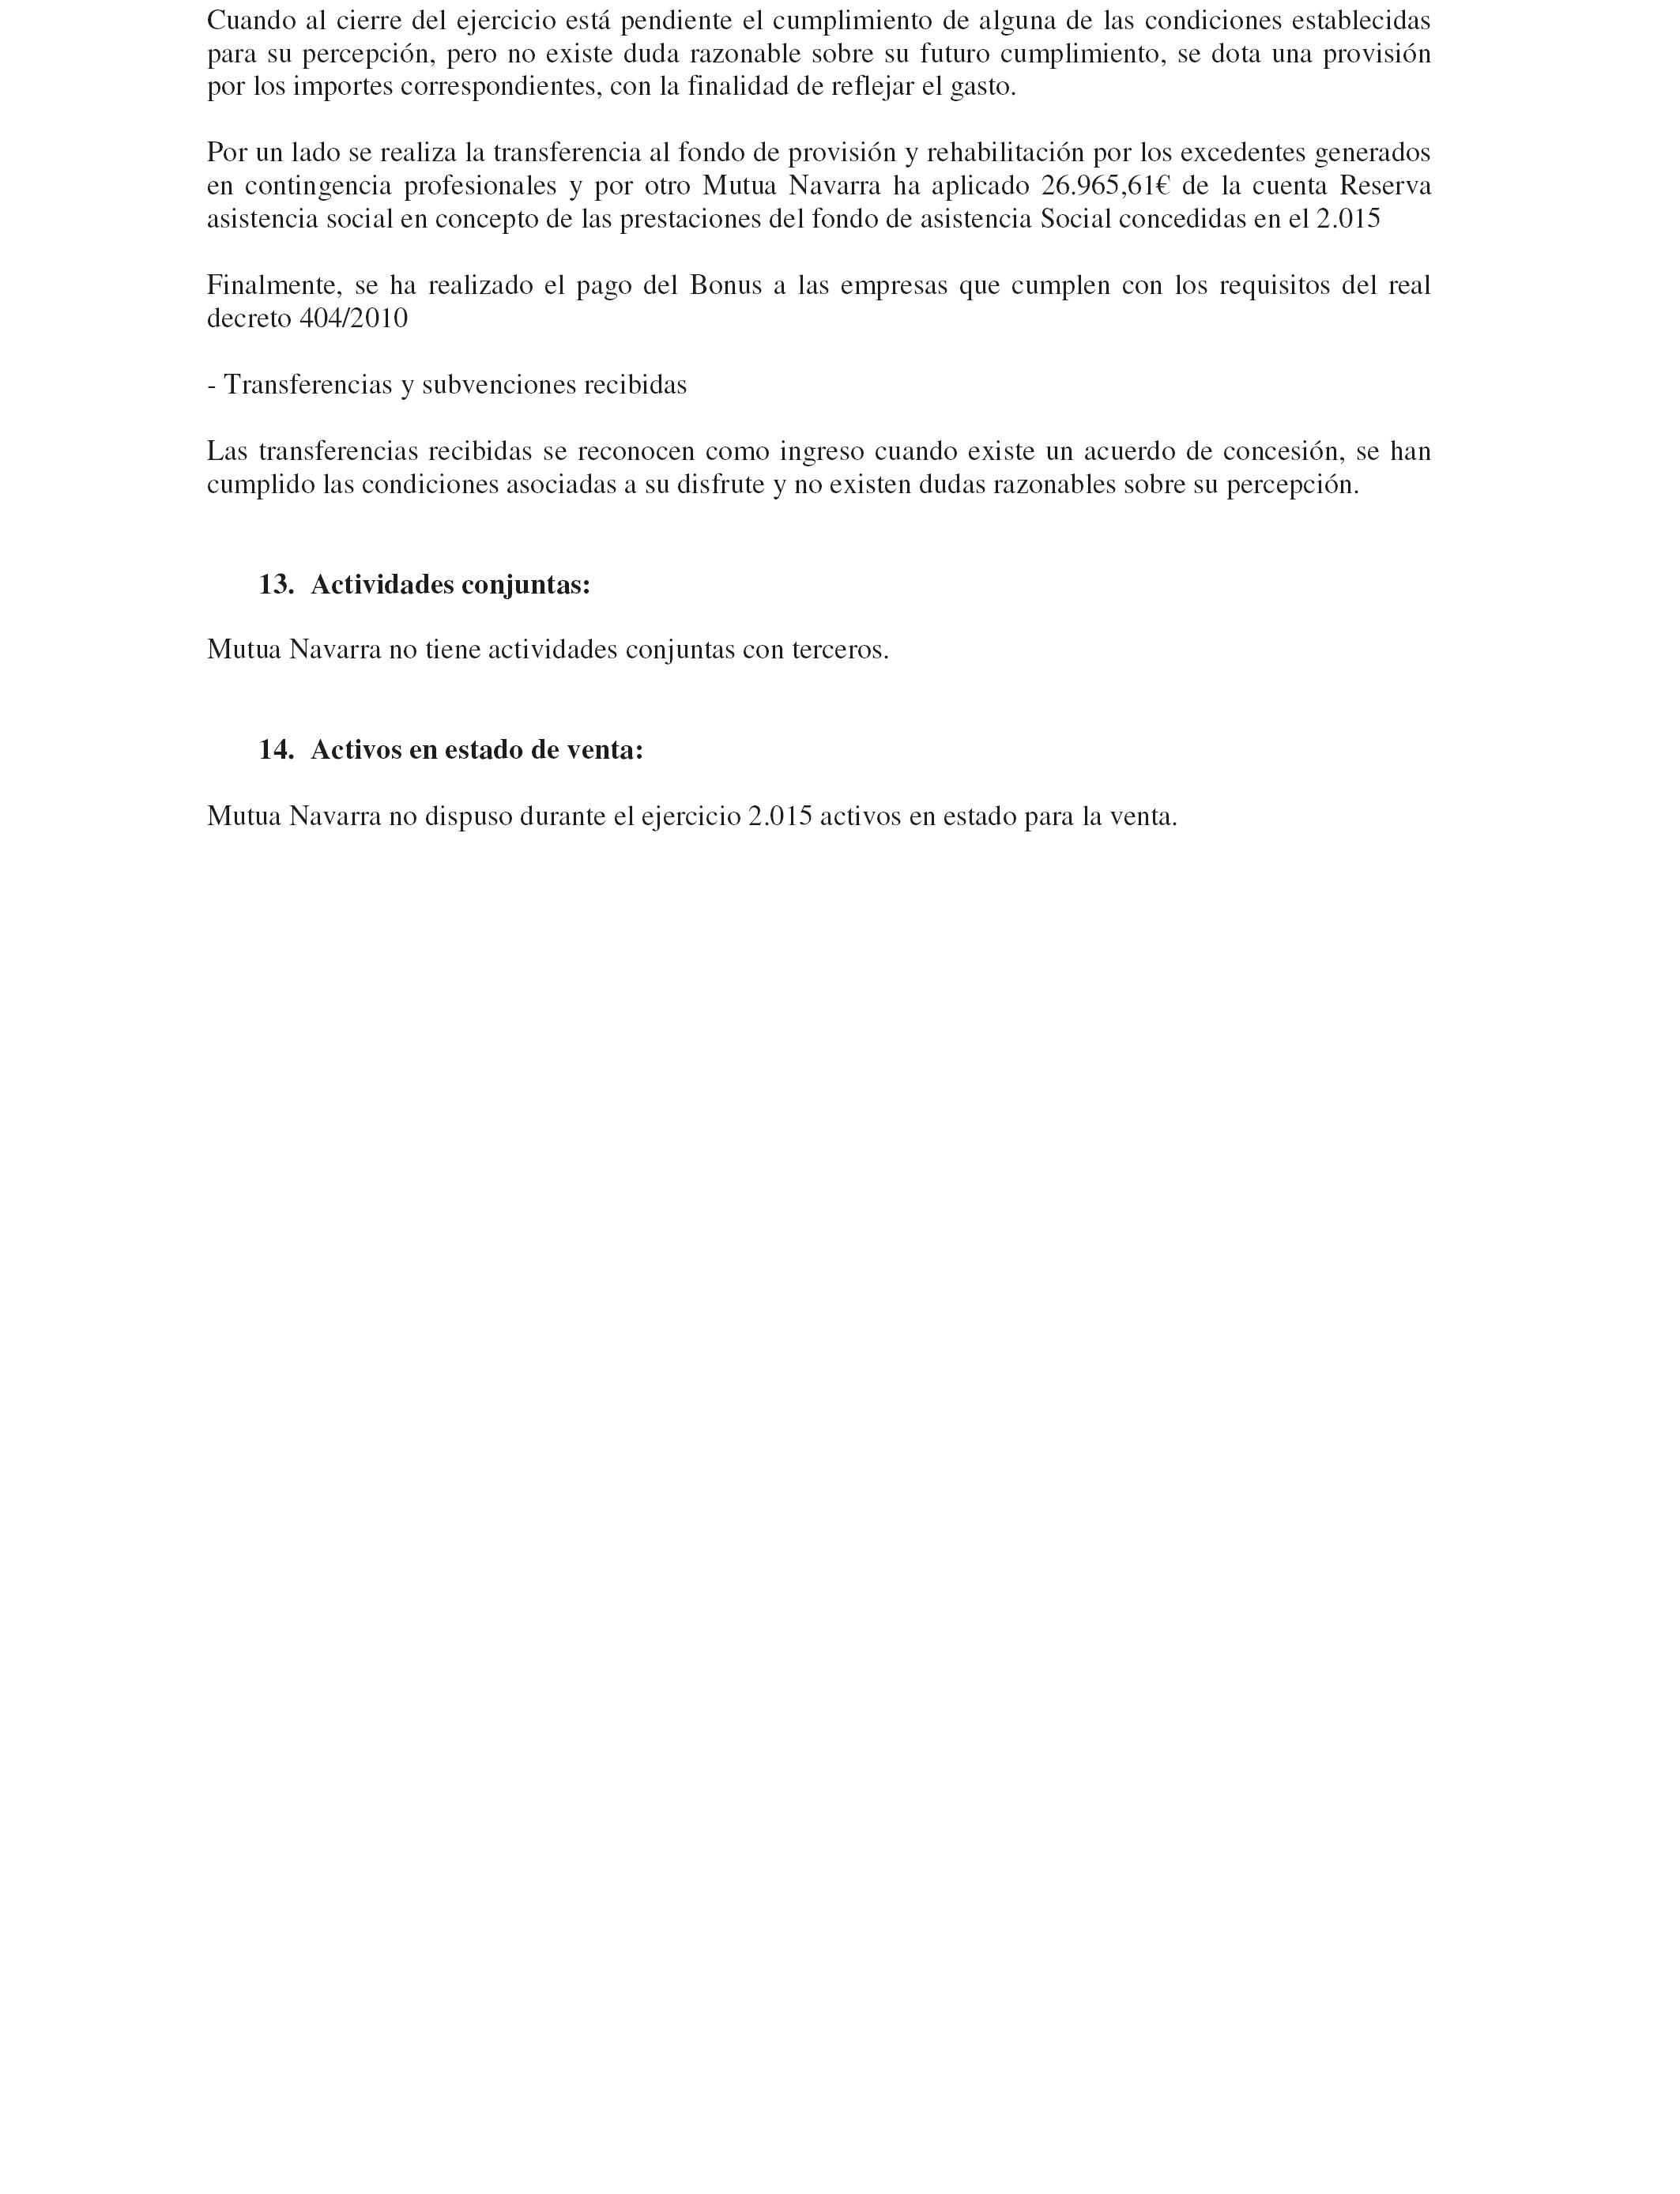 Boees Documento Boe A 2017 301